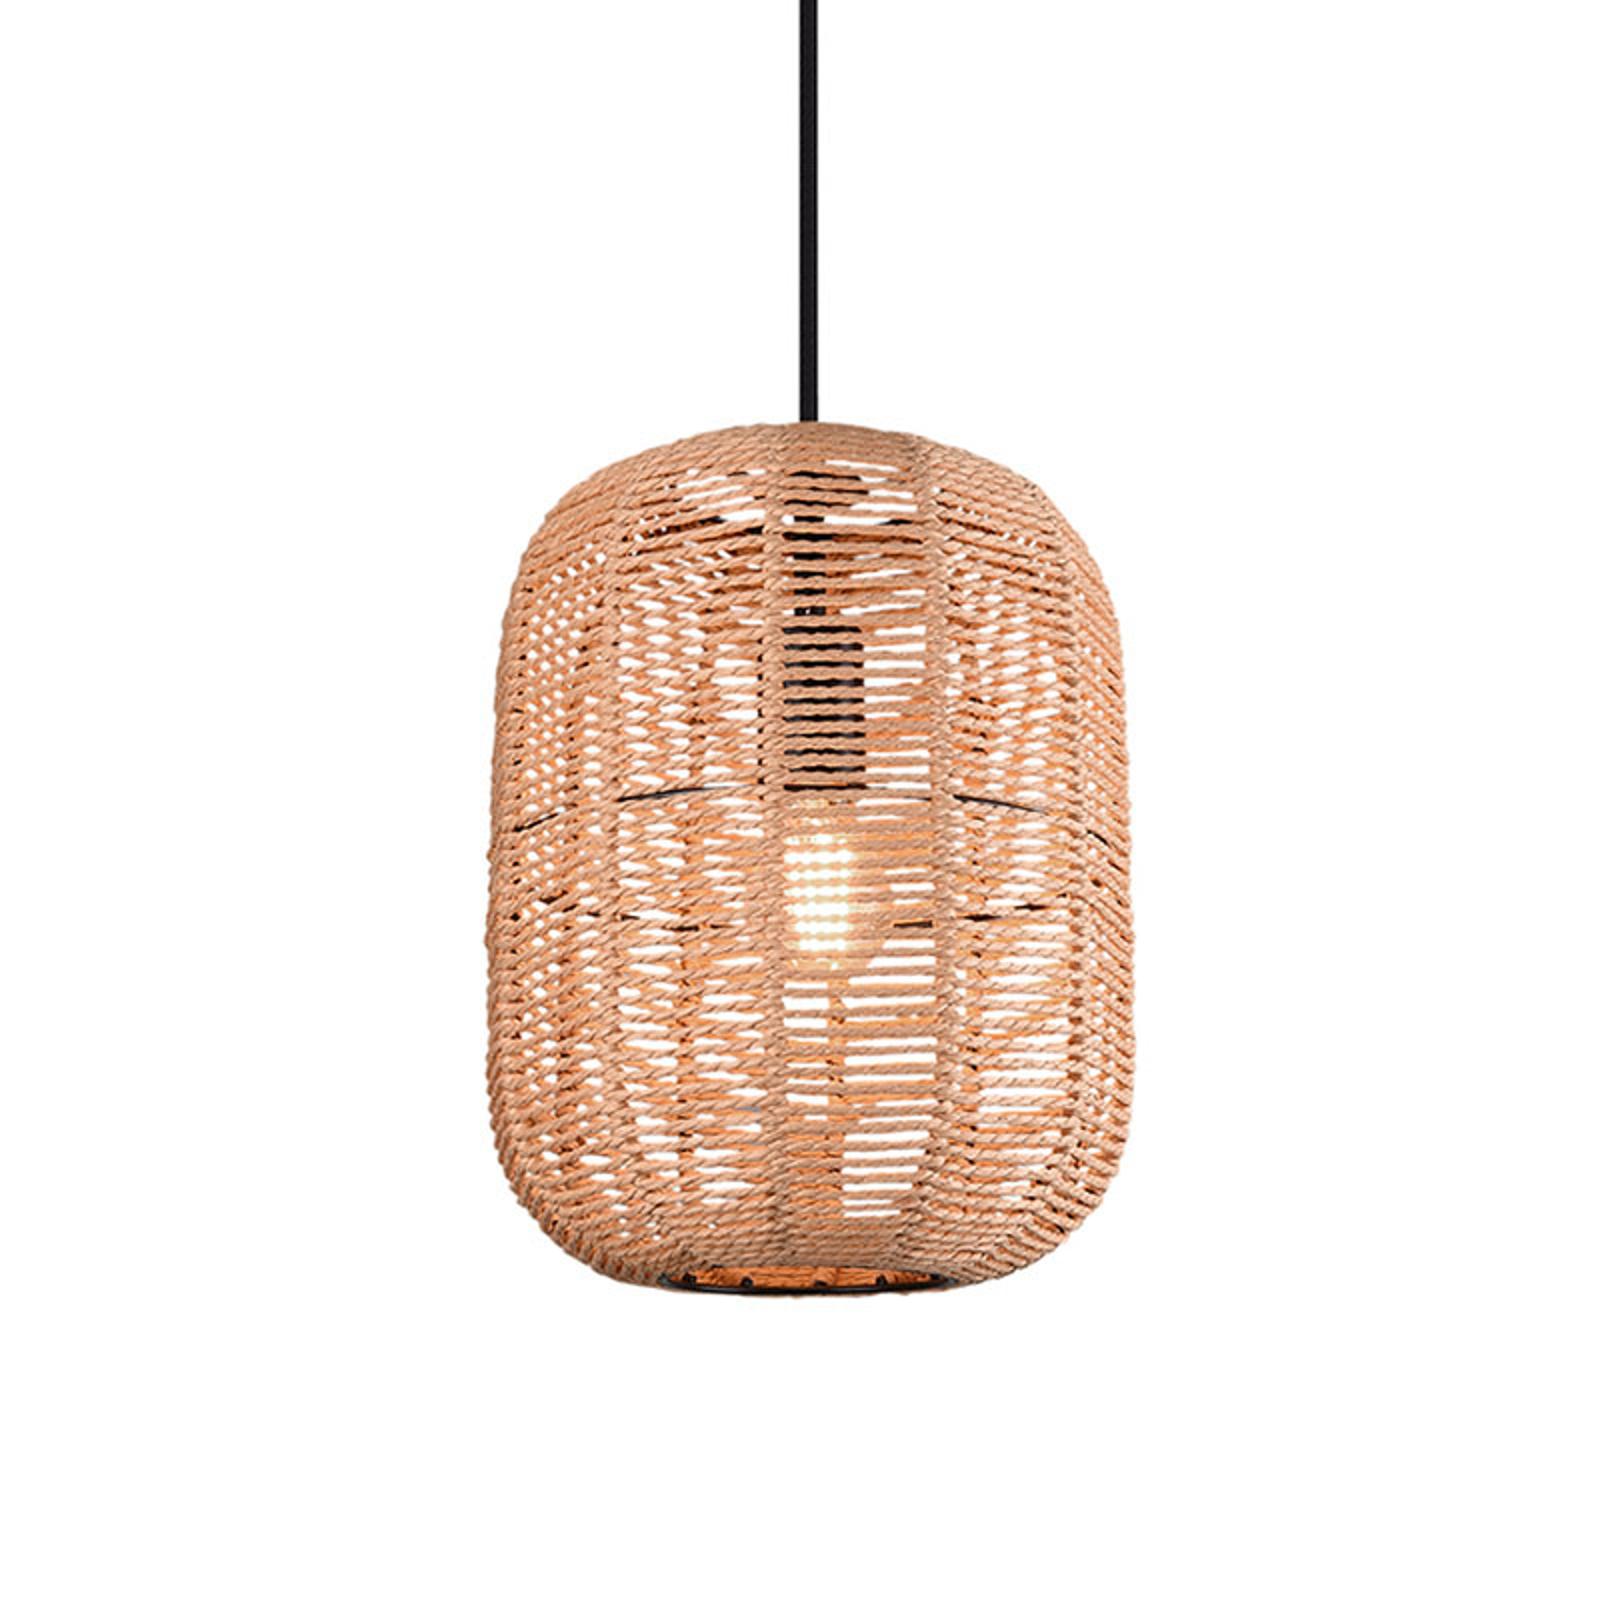 Riippuvalo Runa, sisalvarjostin, 1-lamp. Ø 25 cm